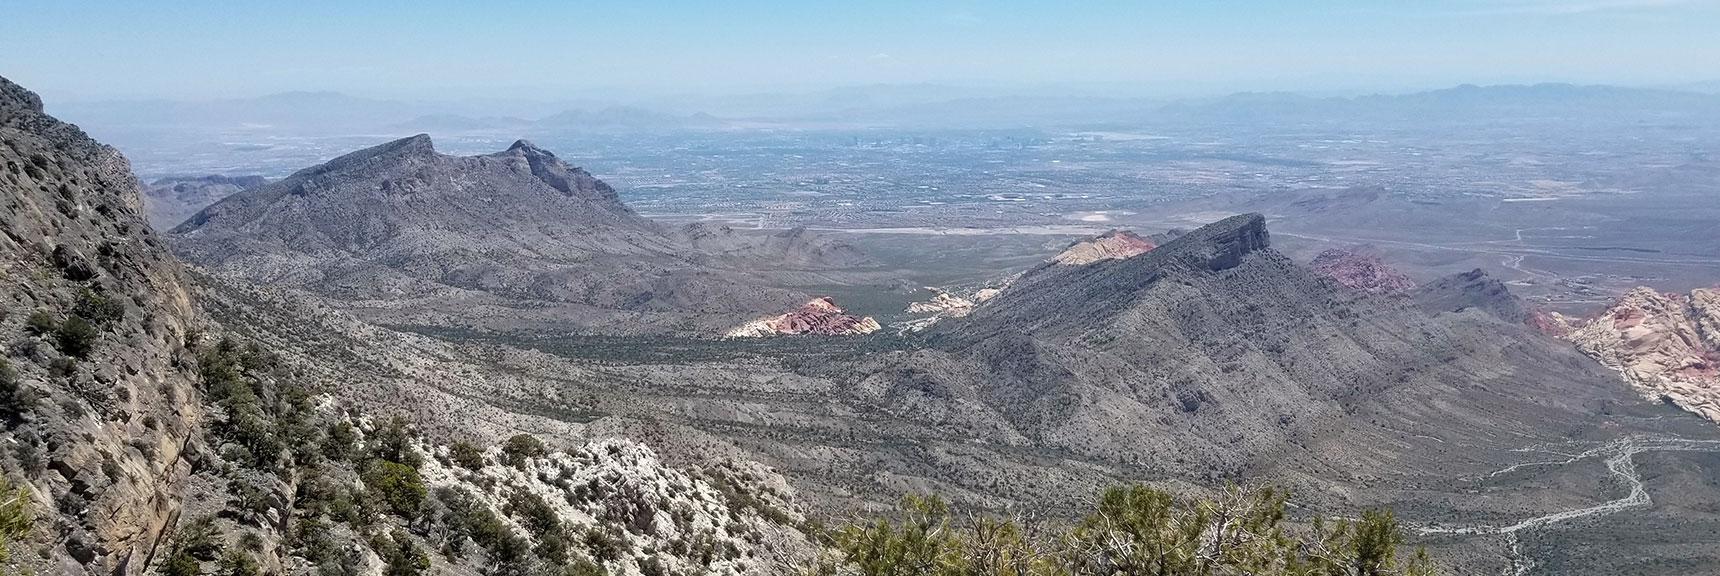 Turtlehead Peak View from Keystone Thrust, La Madre Mountain Wilderness, Nevada